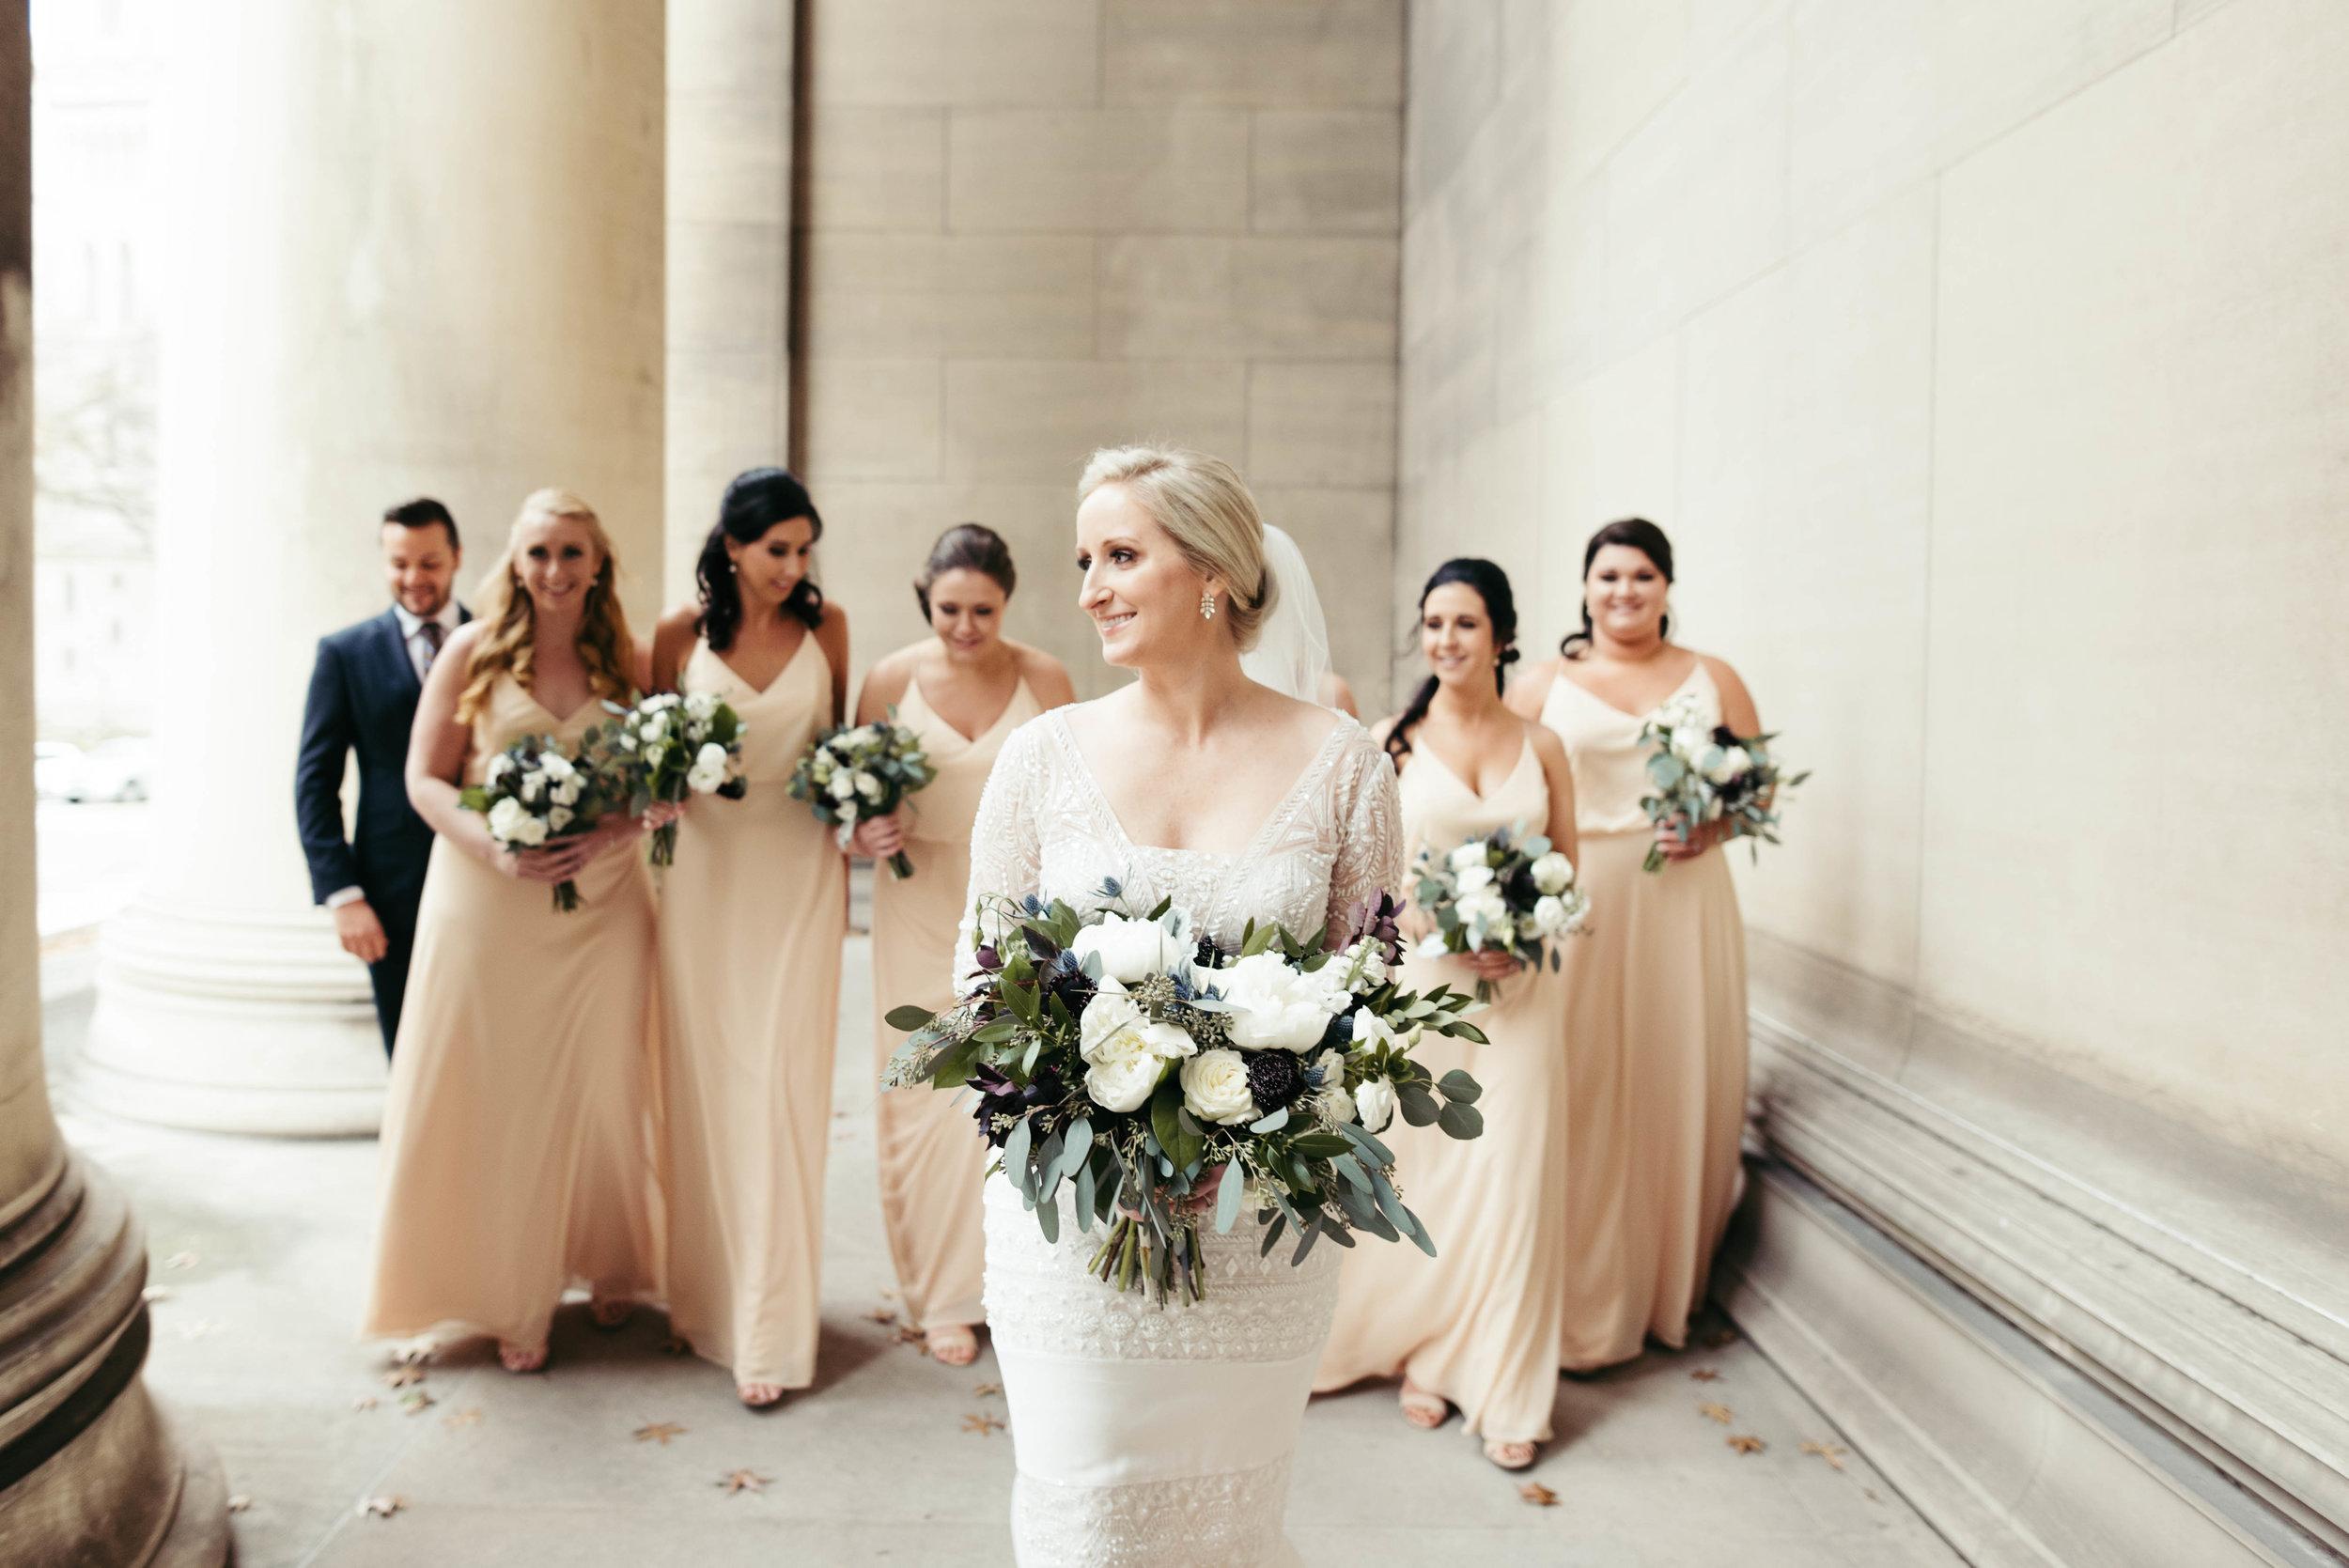 renaissance hotel wedding photos-18.jpg